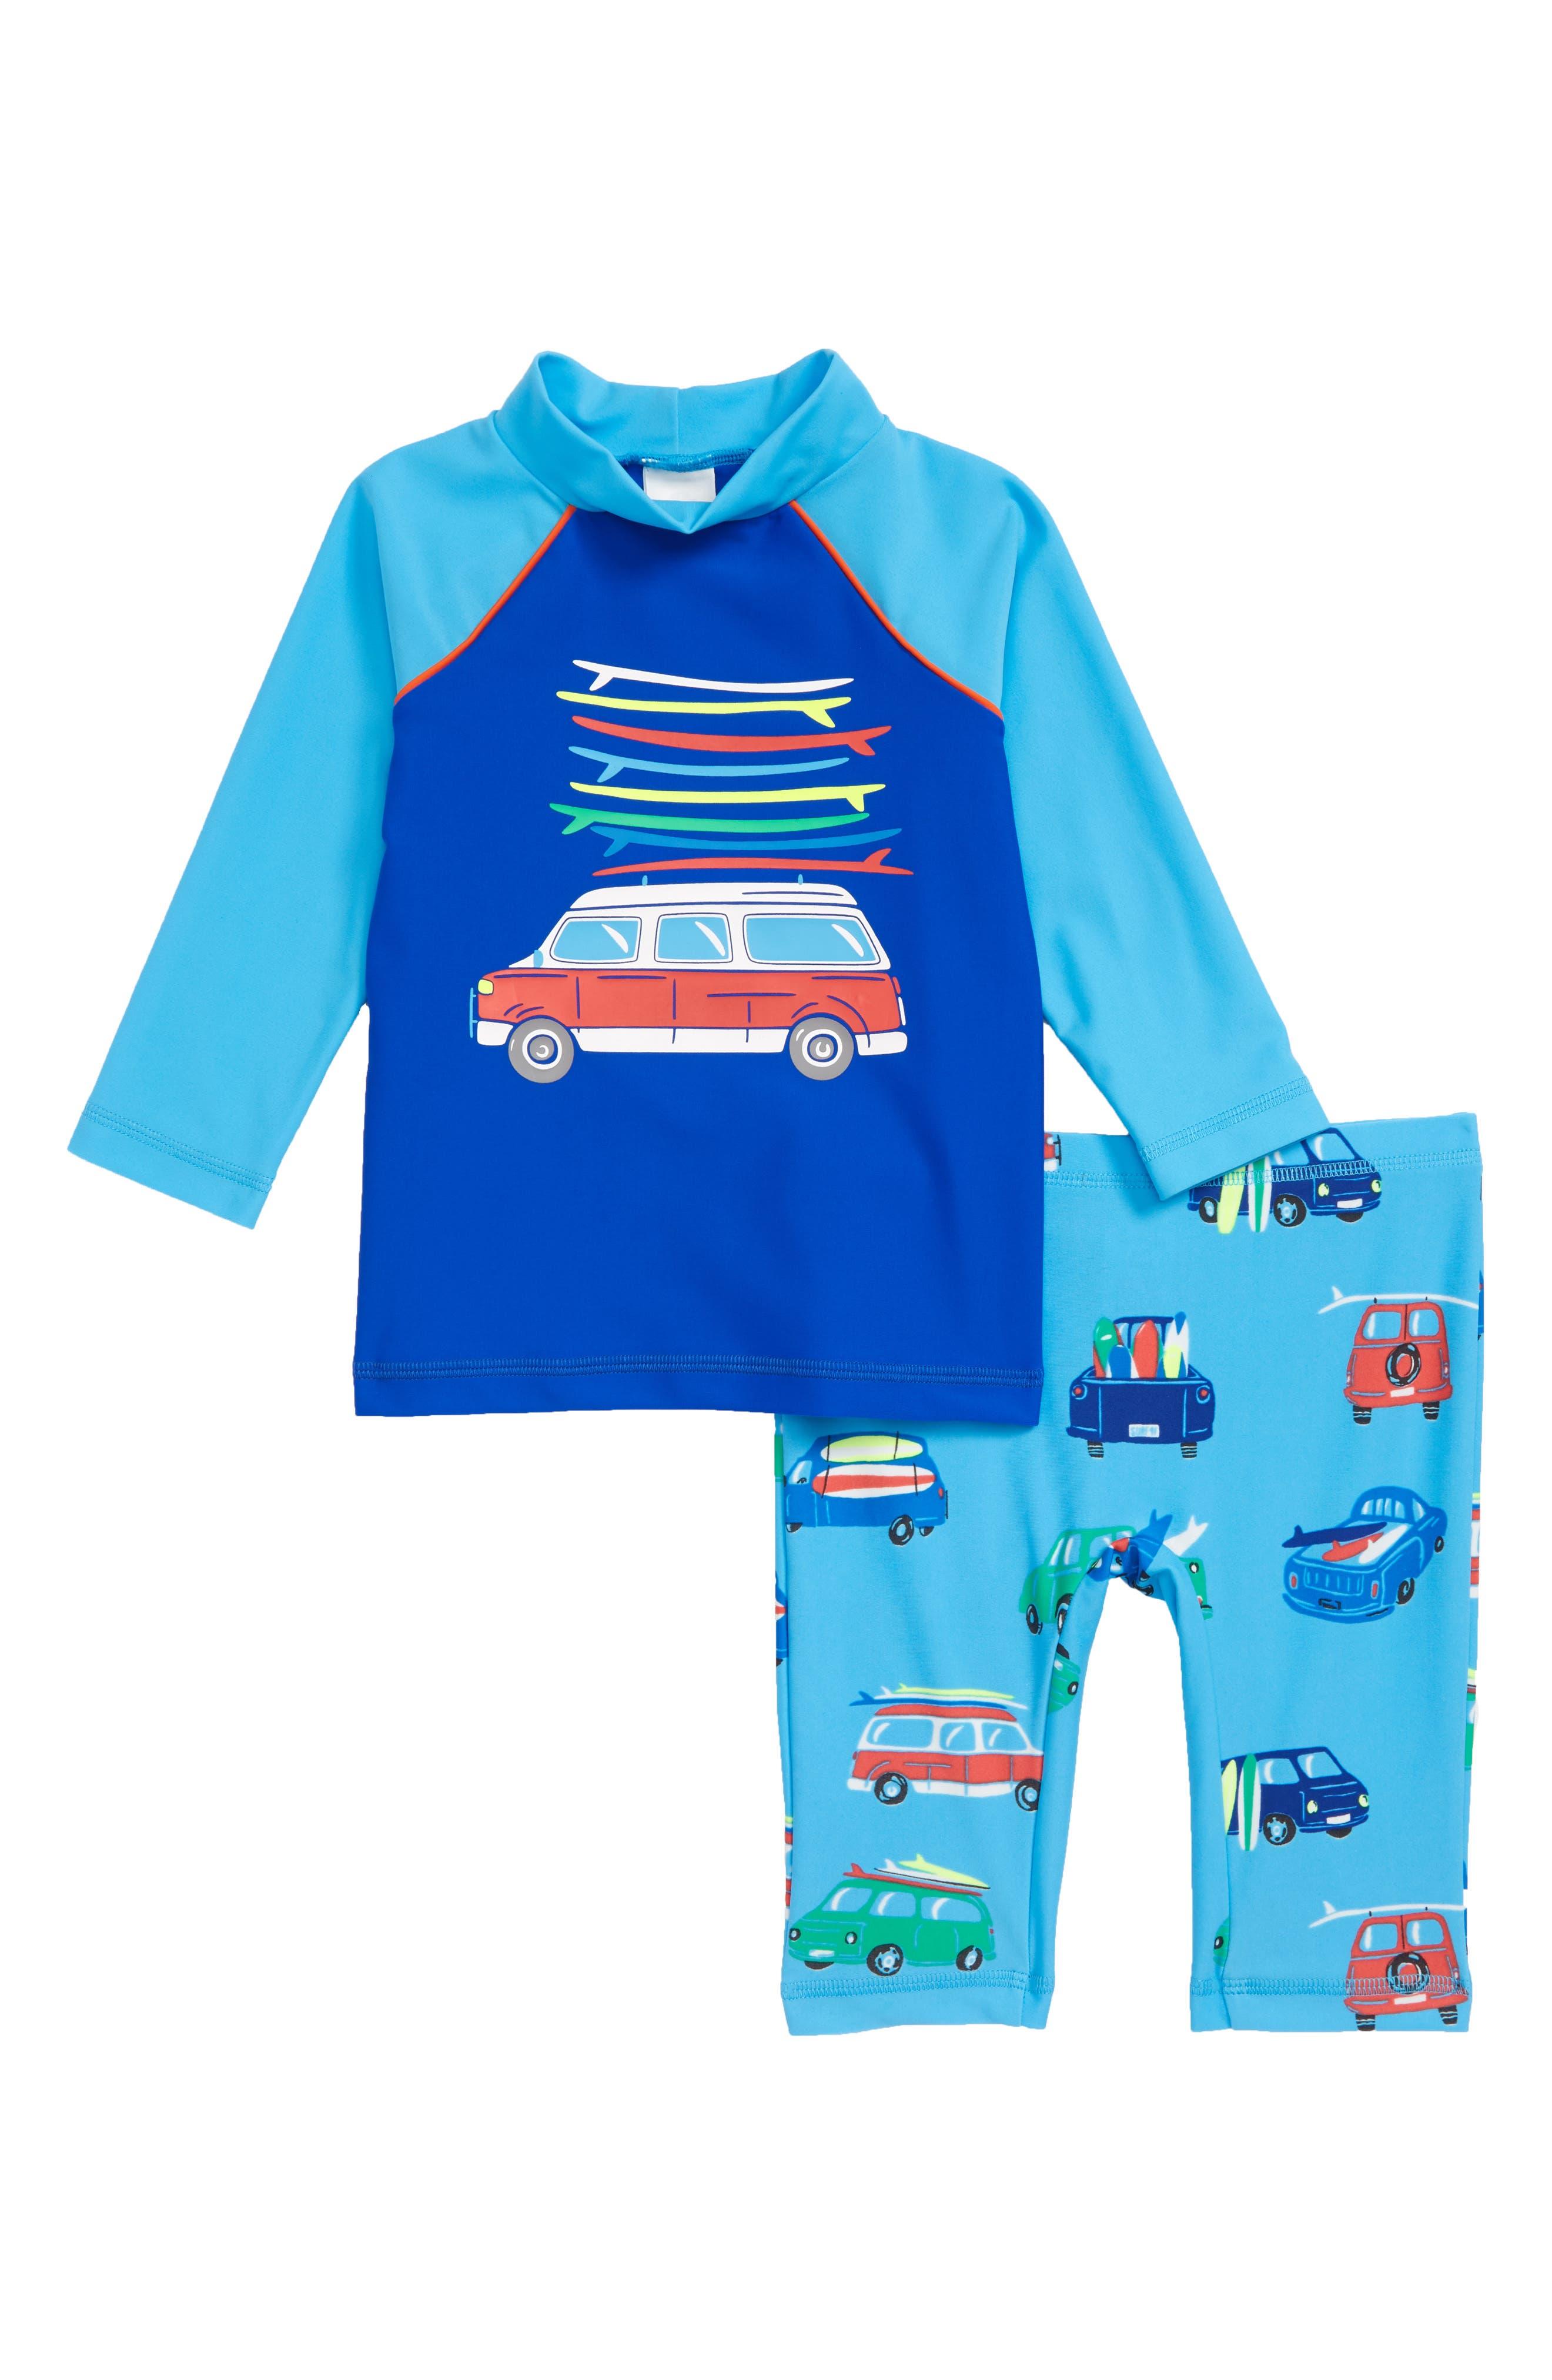 Two-Piece Van Surf Swimsuit,                         Main,                         color, Surfboard Blue Surf Van